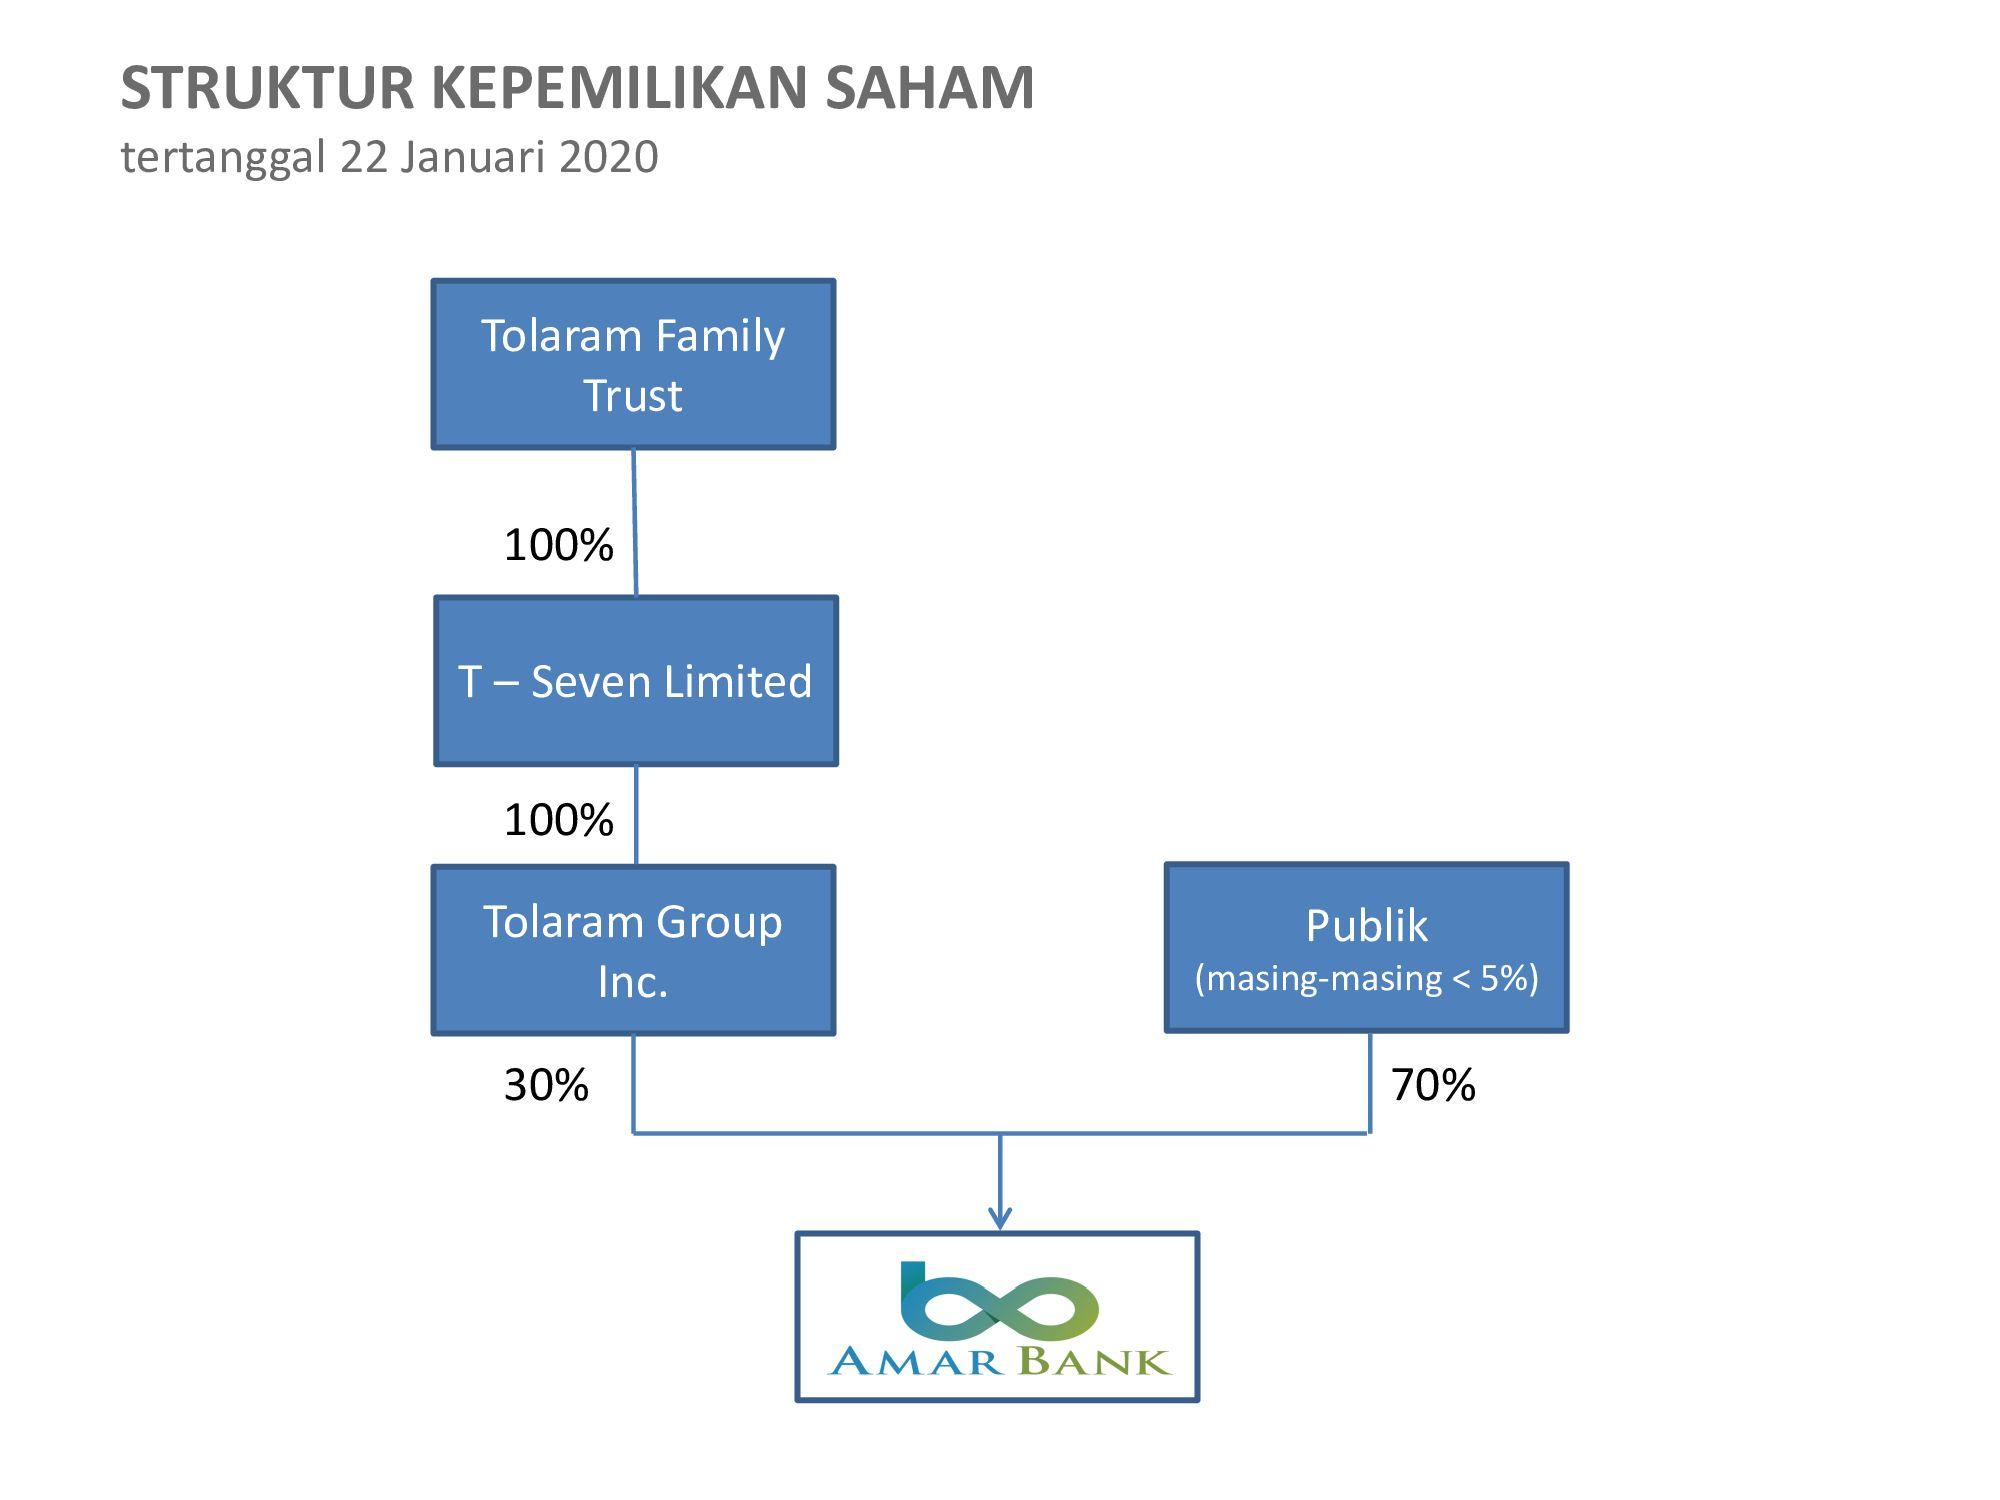 Struktur Kepemilikan - Amar Bank